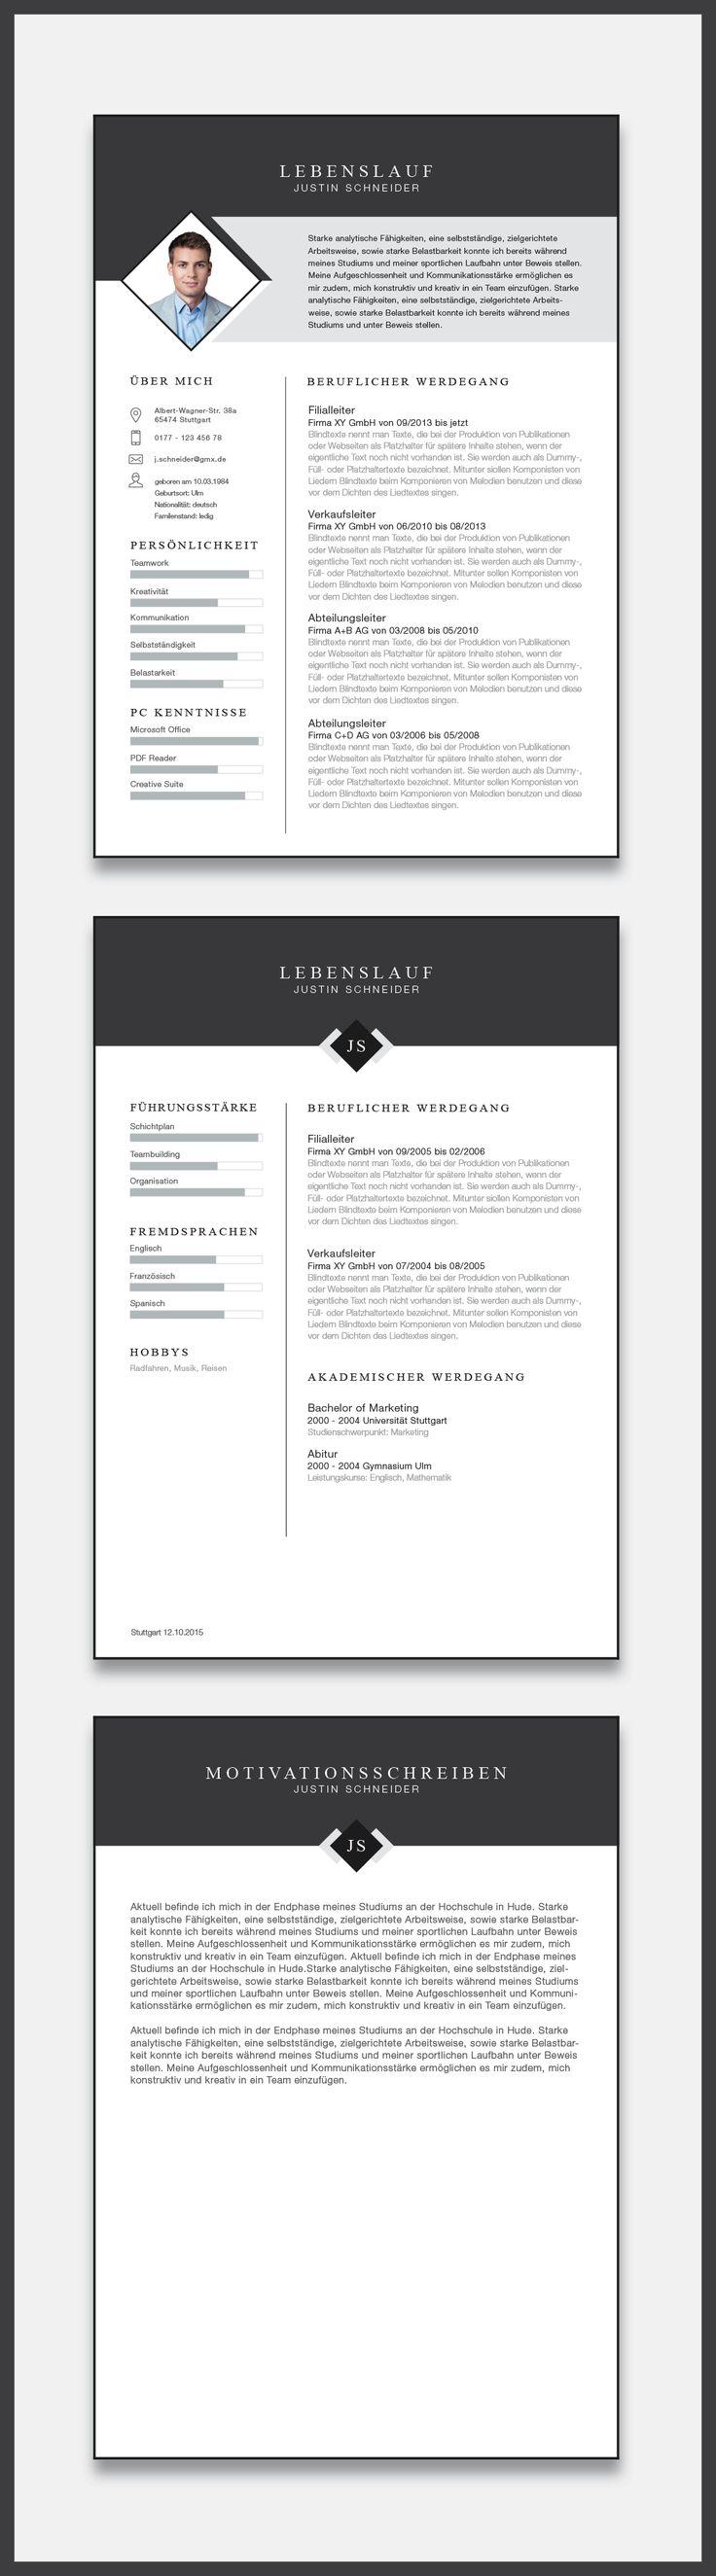 38 best CV Designs images on Pinterest | Resume templates, Cv ...